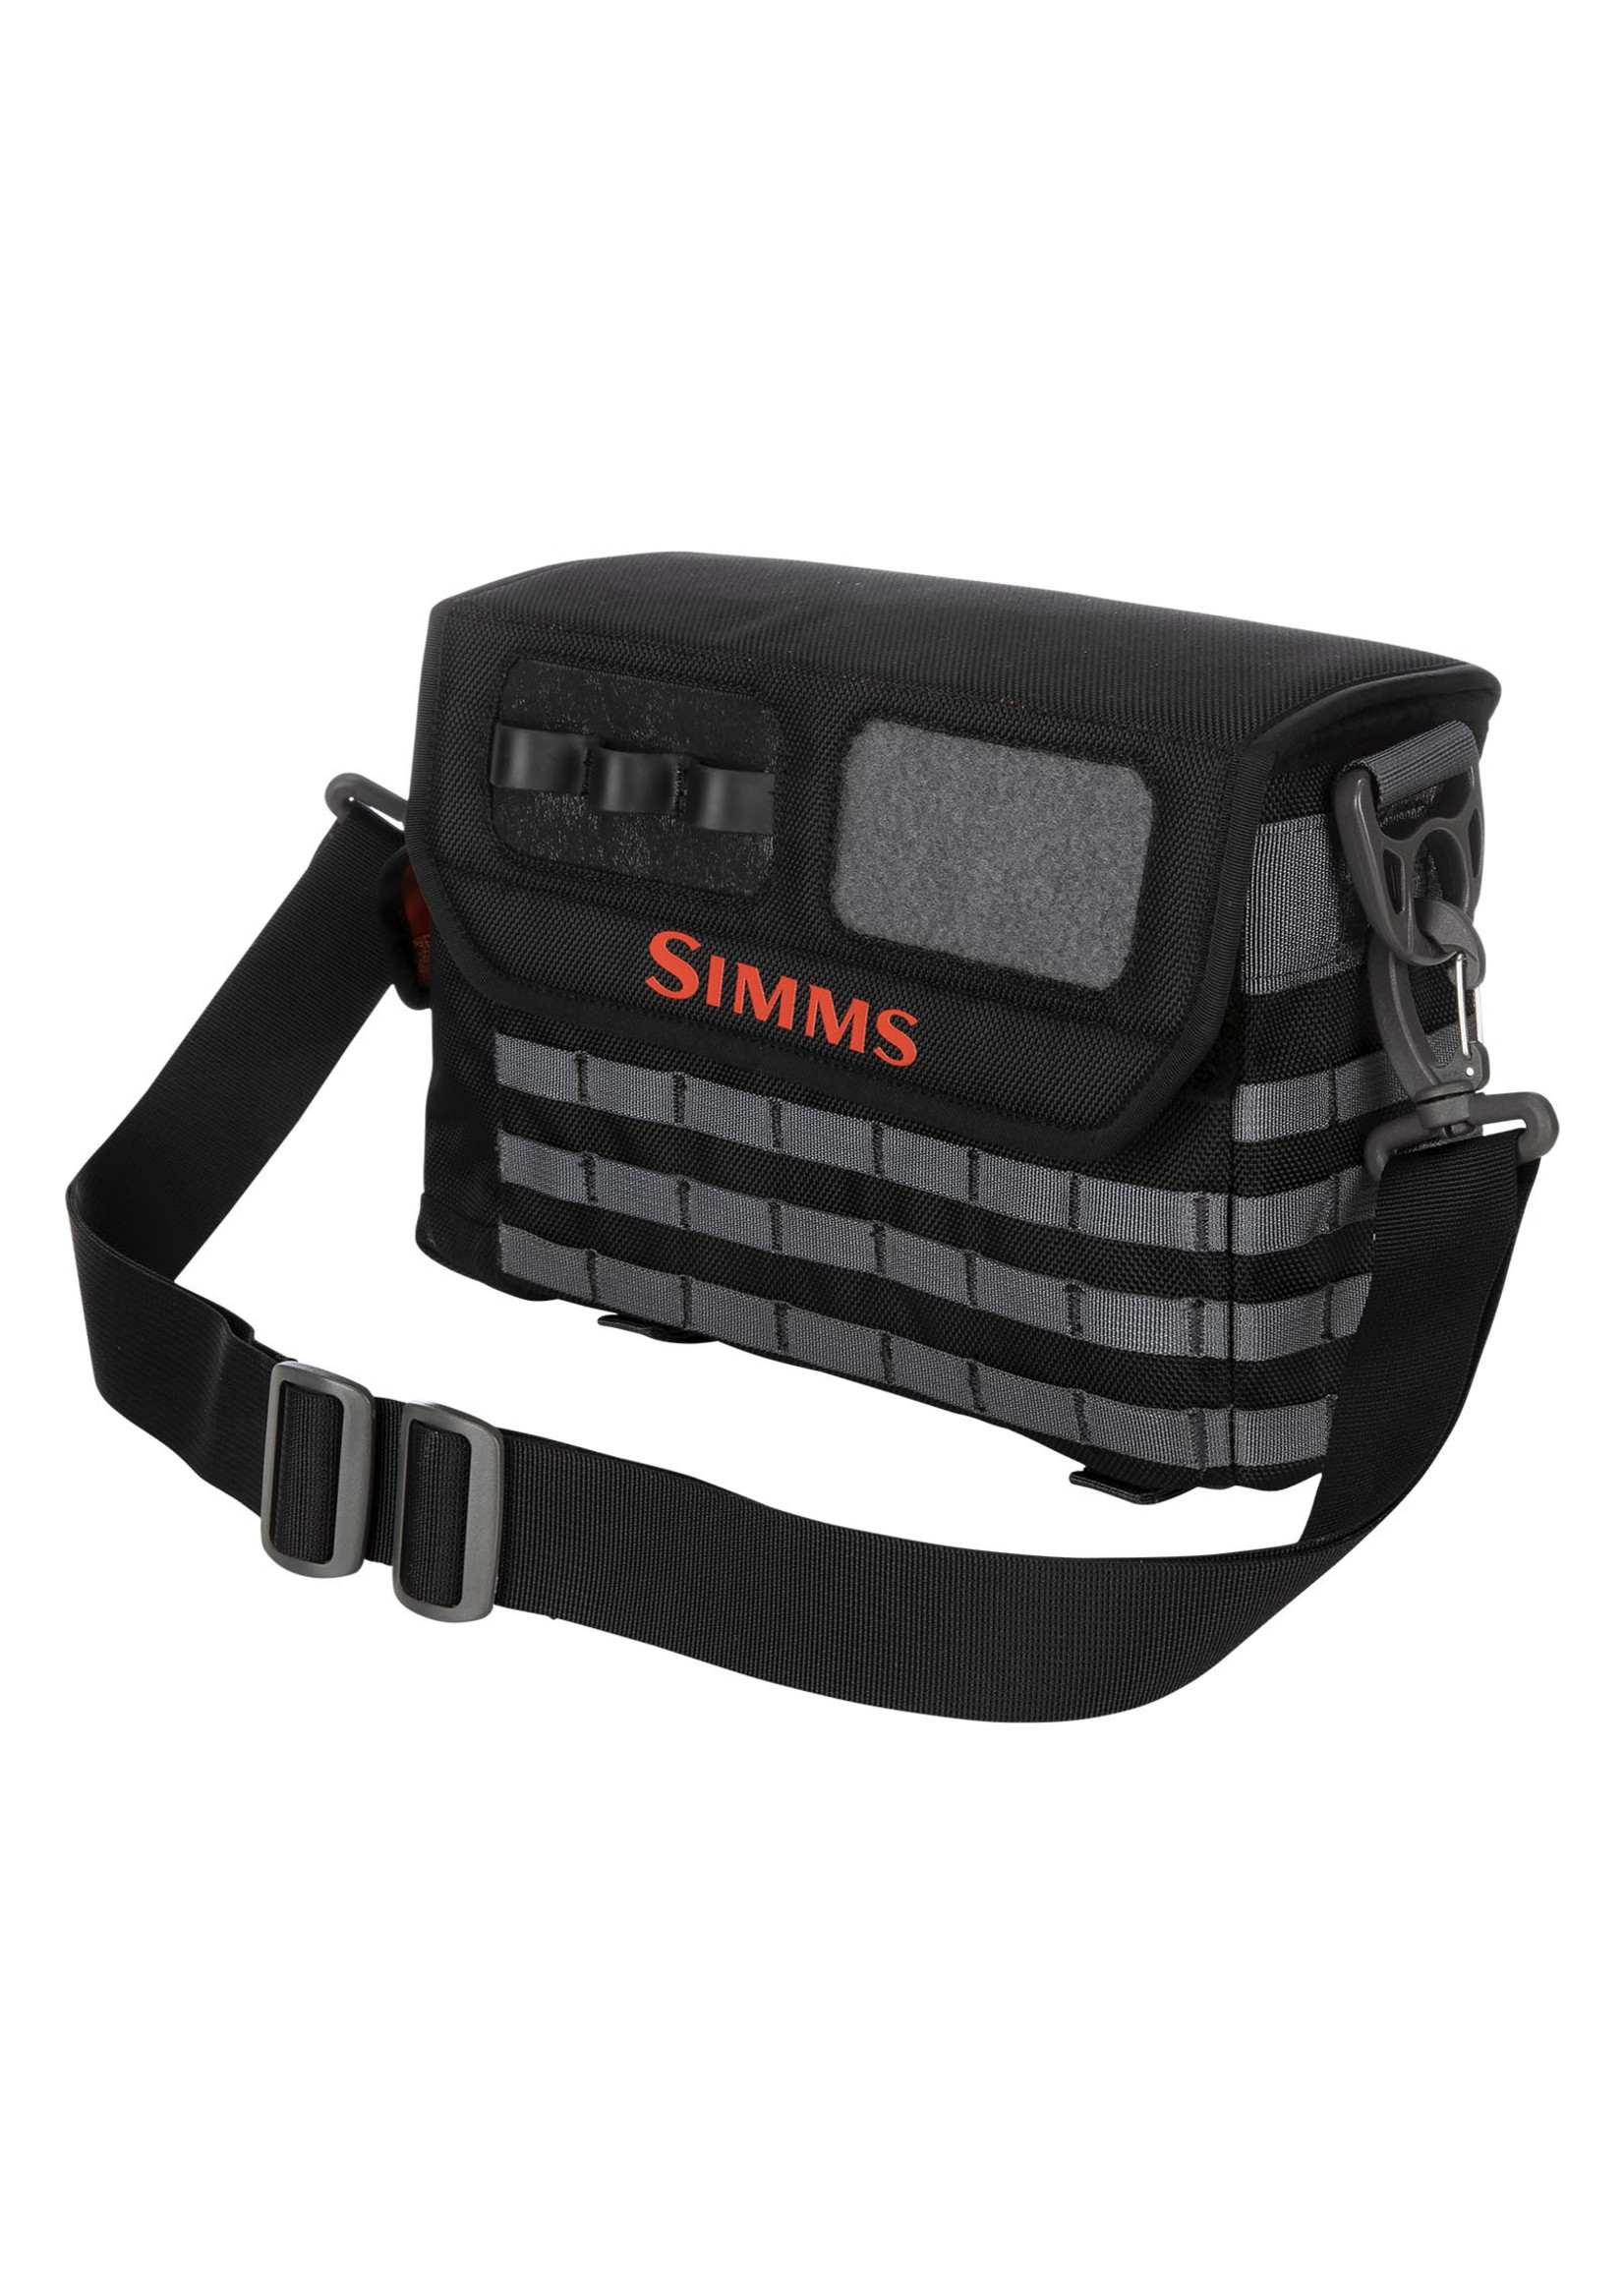 Simms Fishing Simms Open Water Tactical Waist Pack Black